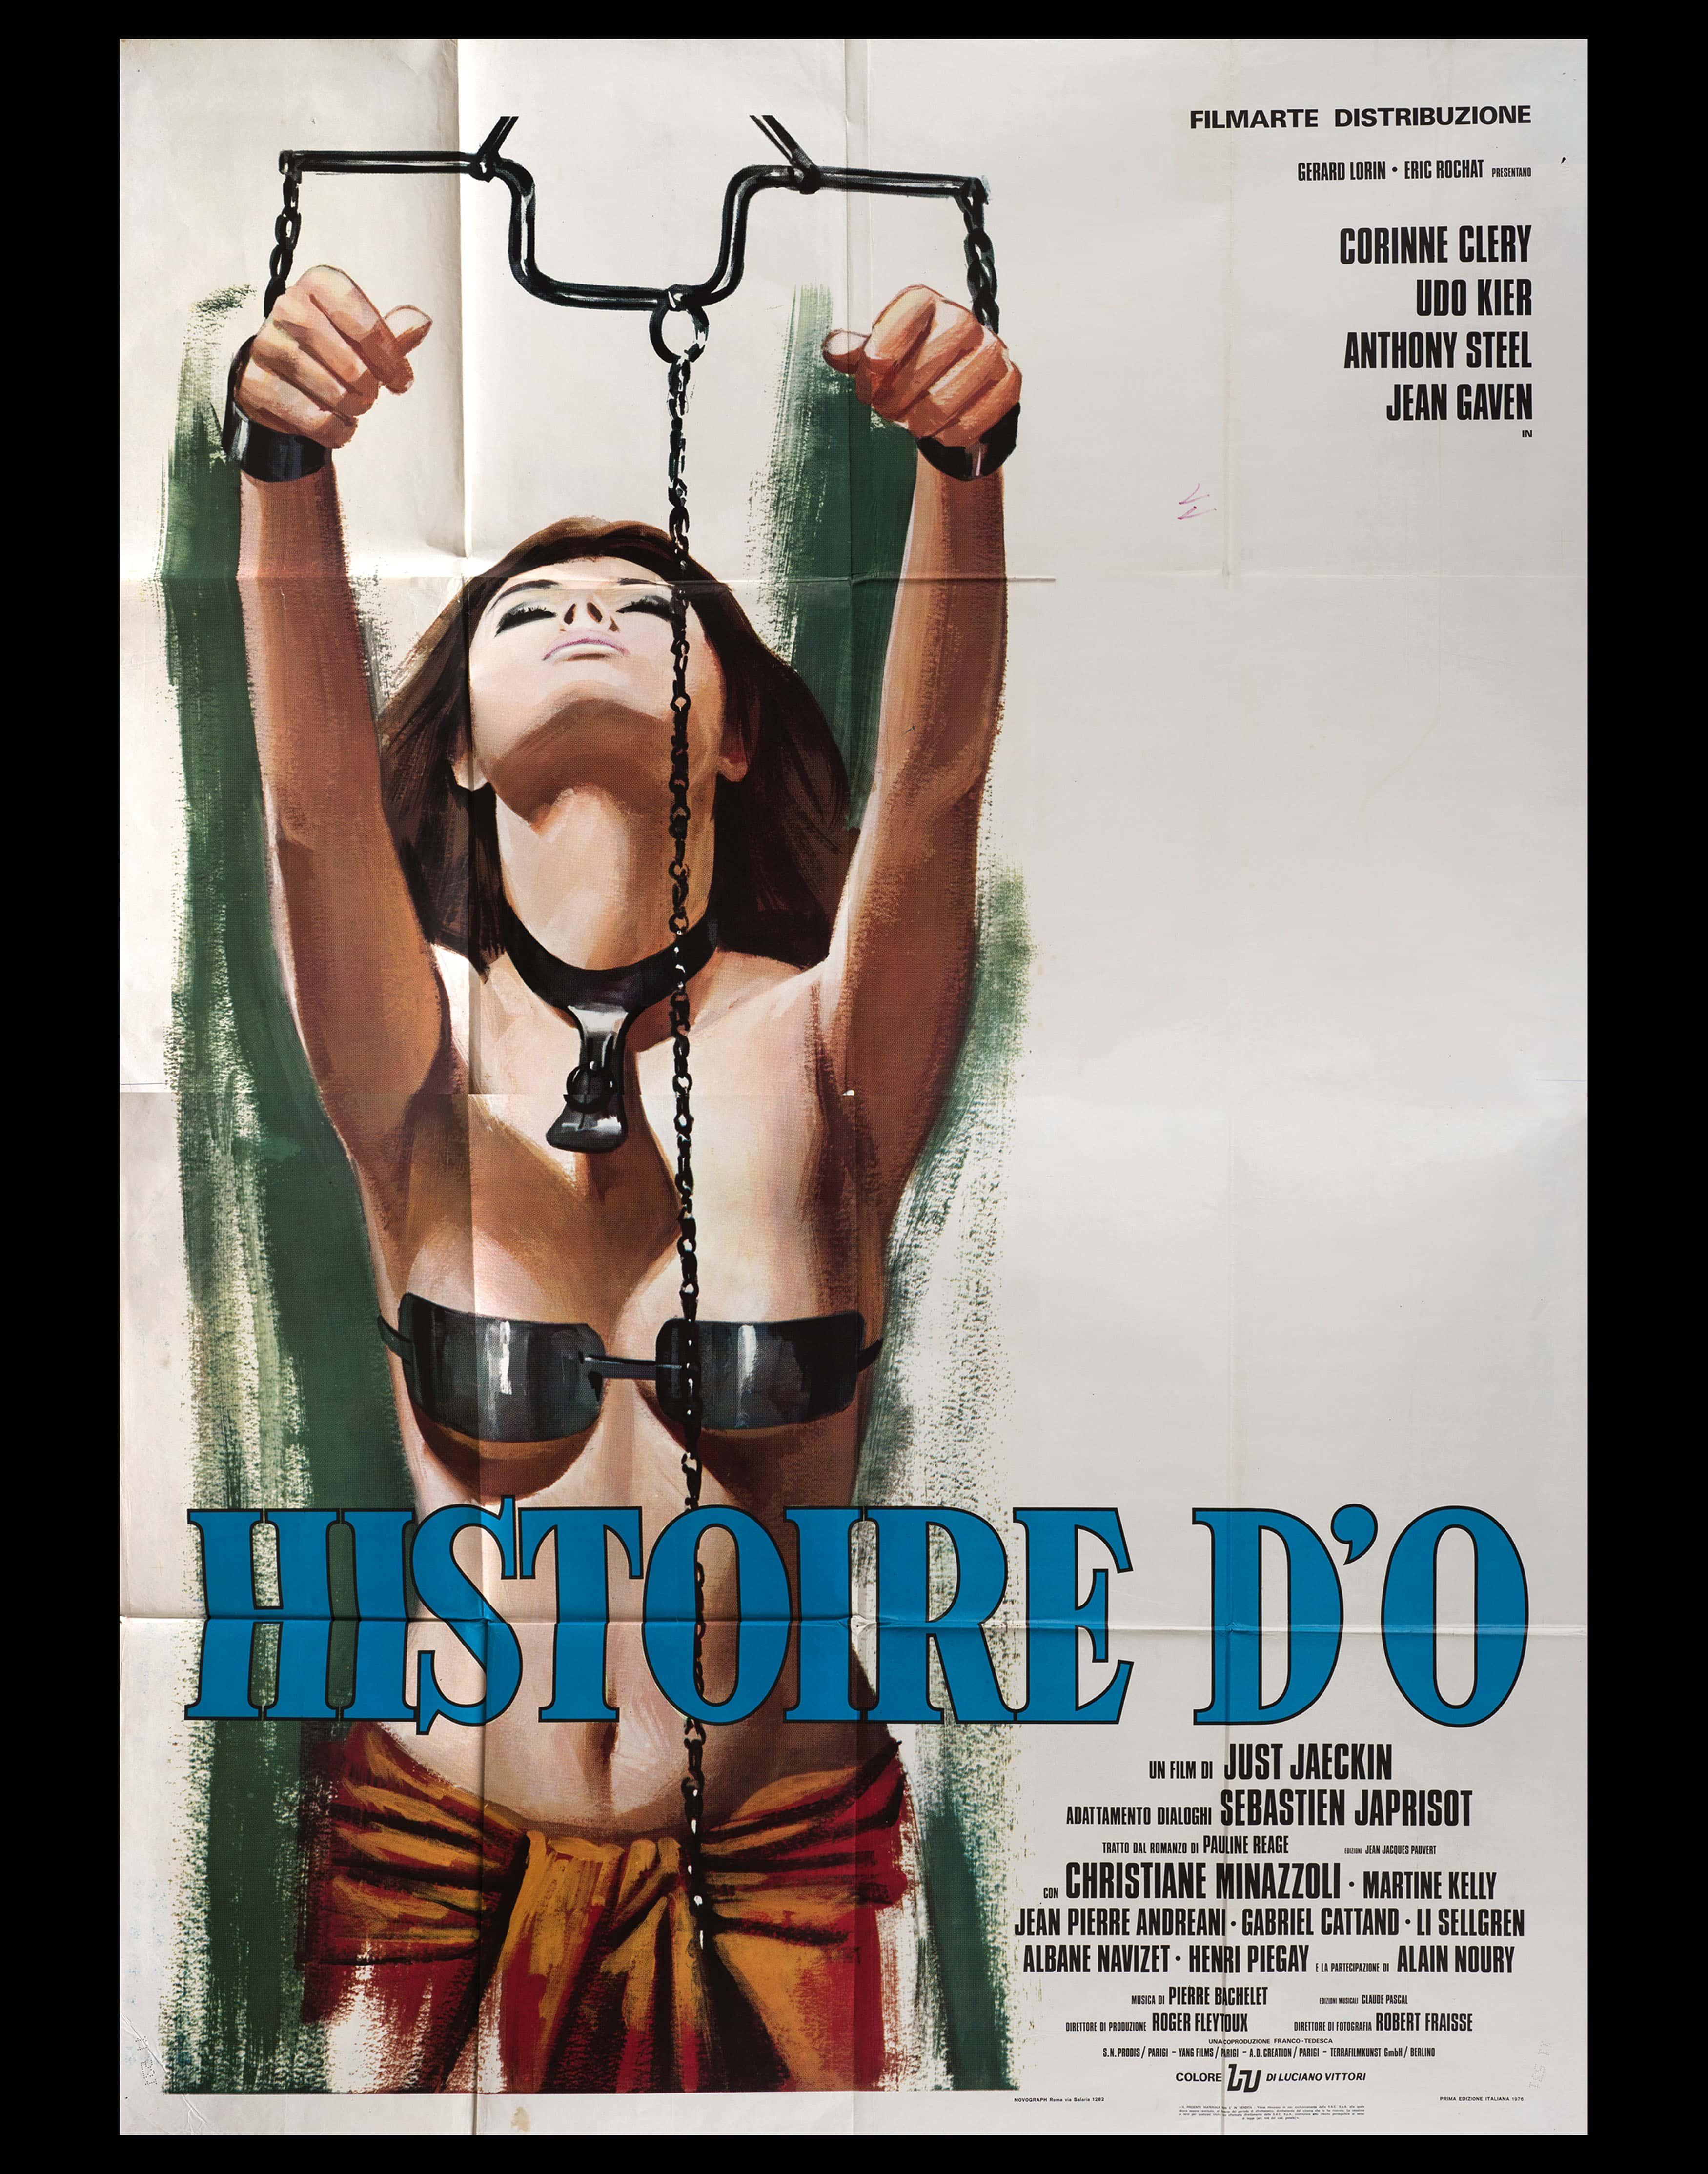 Lot 704 - HISTOIRE D'O